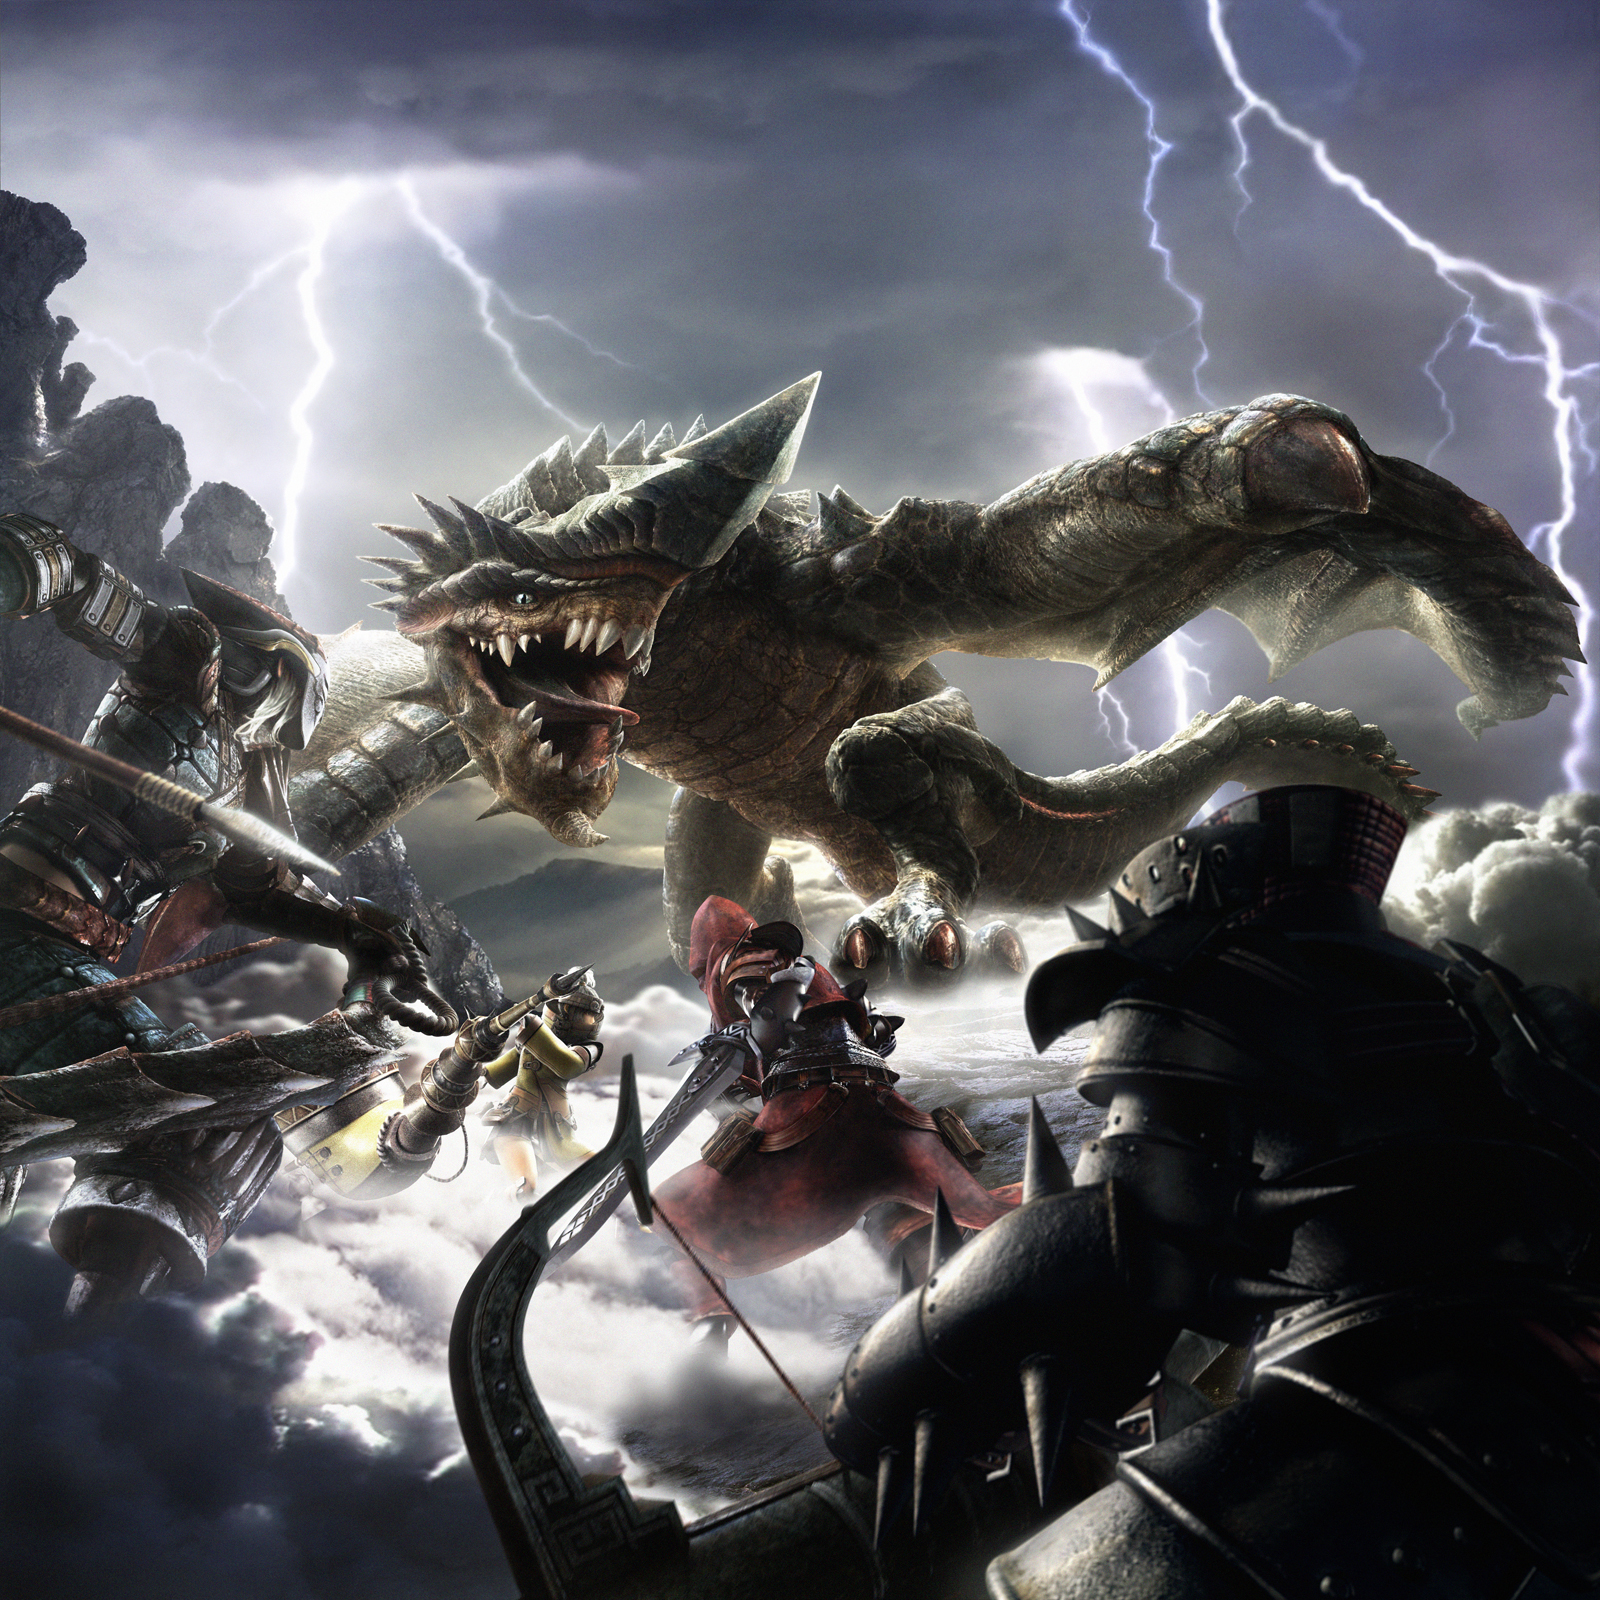 Gurenzeburu | Monster Hunter Wiki | FANDOM powered by Wikia